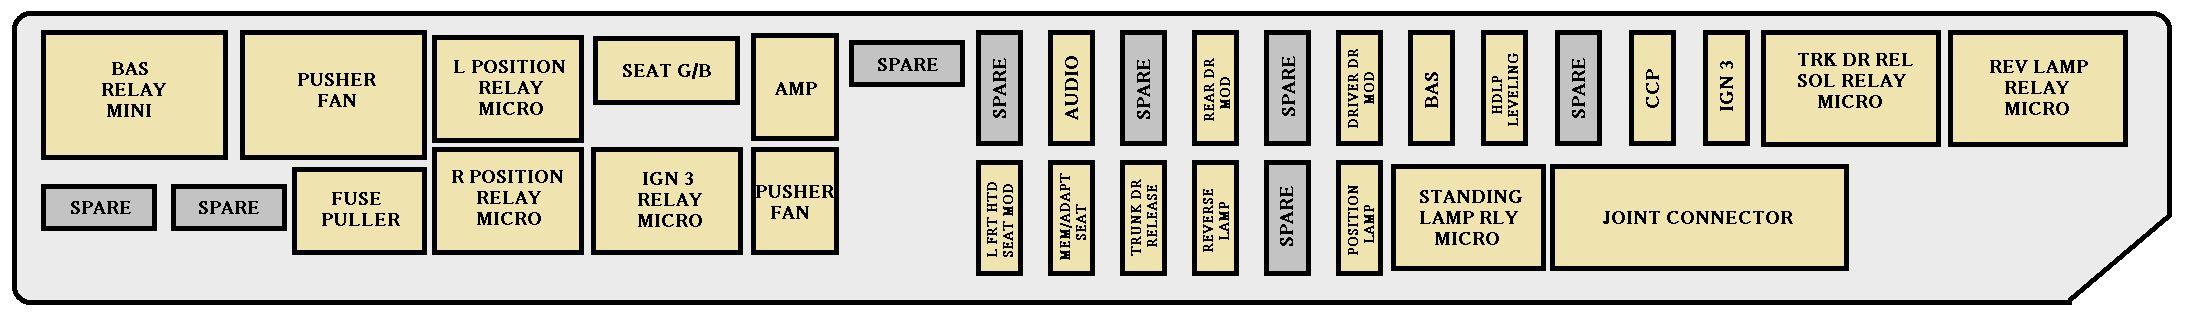 OY_6694] 07 Cadillac Cts Fuse Diagram Schematic WiringKook Faun Tivexi Socad Alma Adit Gue45 Mohammedshrine Librar Wiring 101